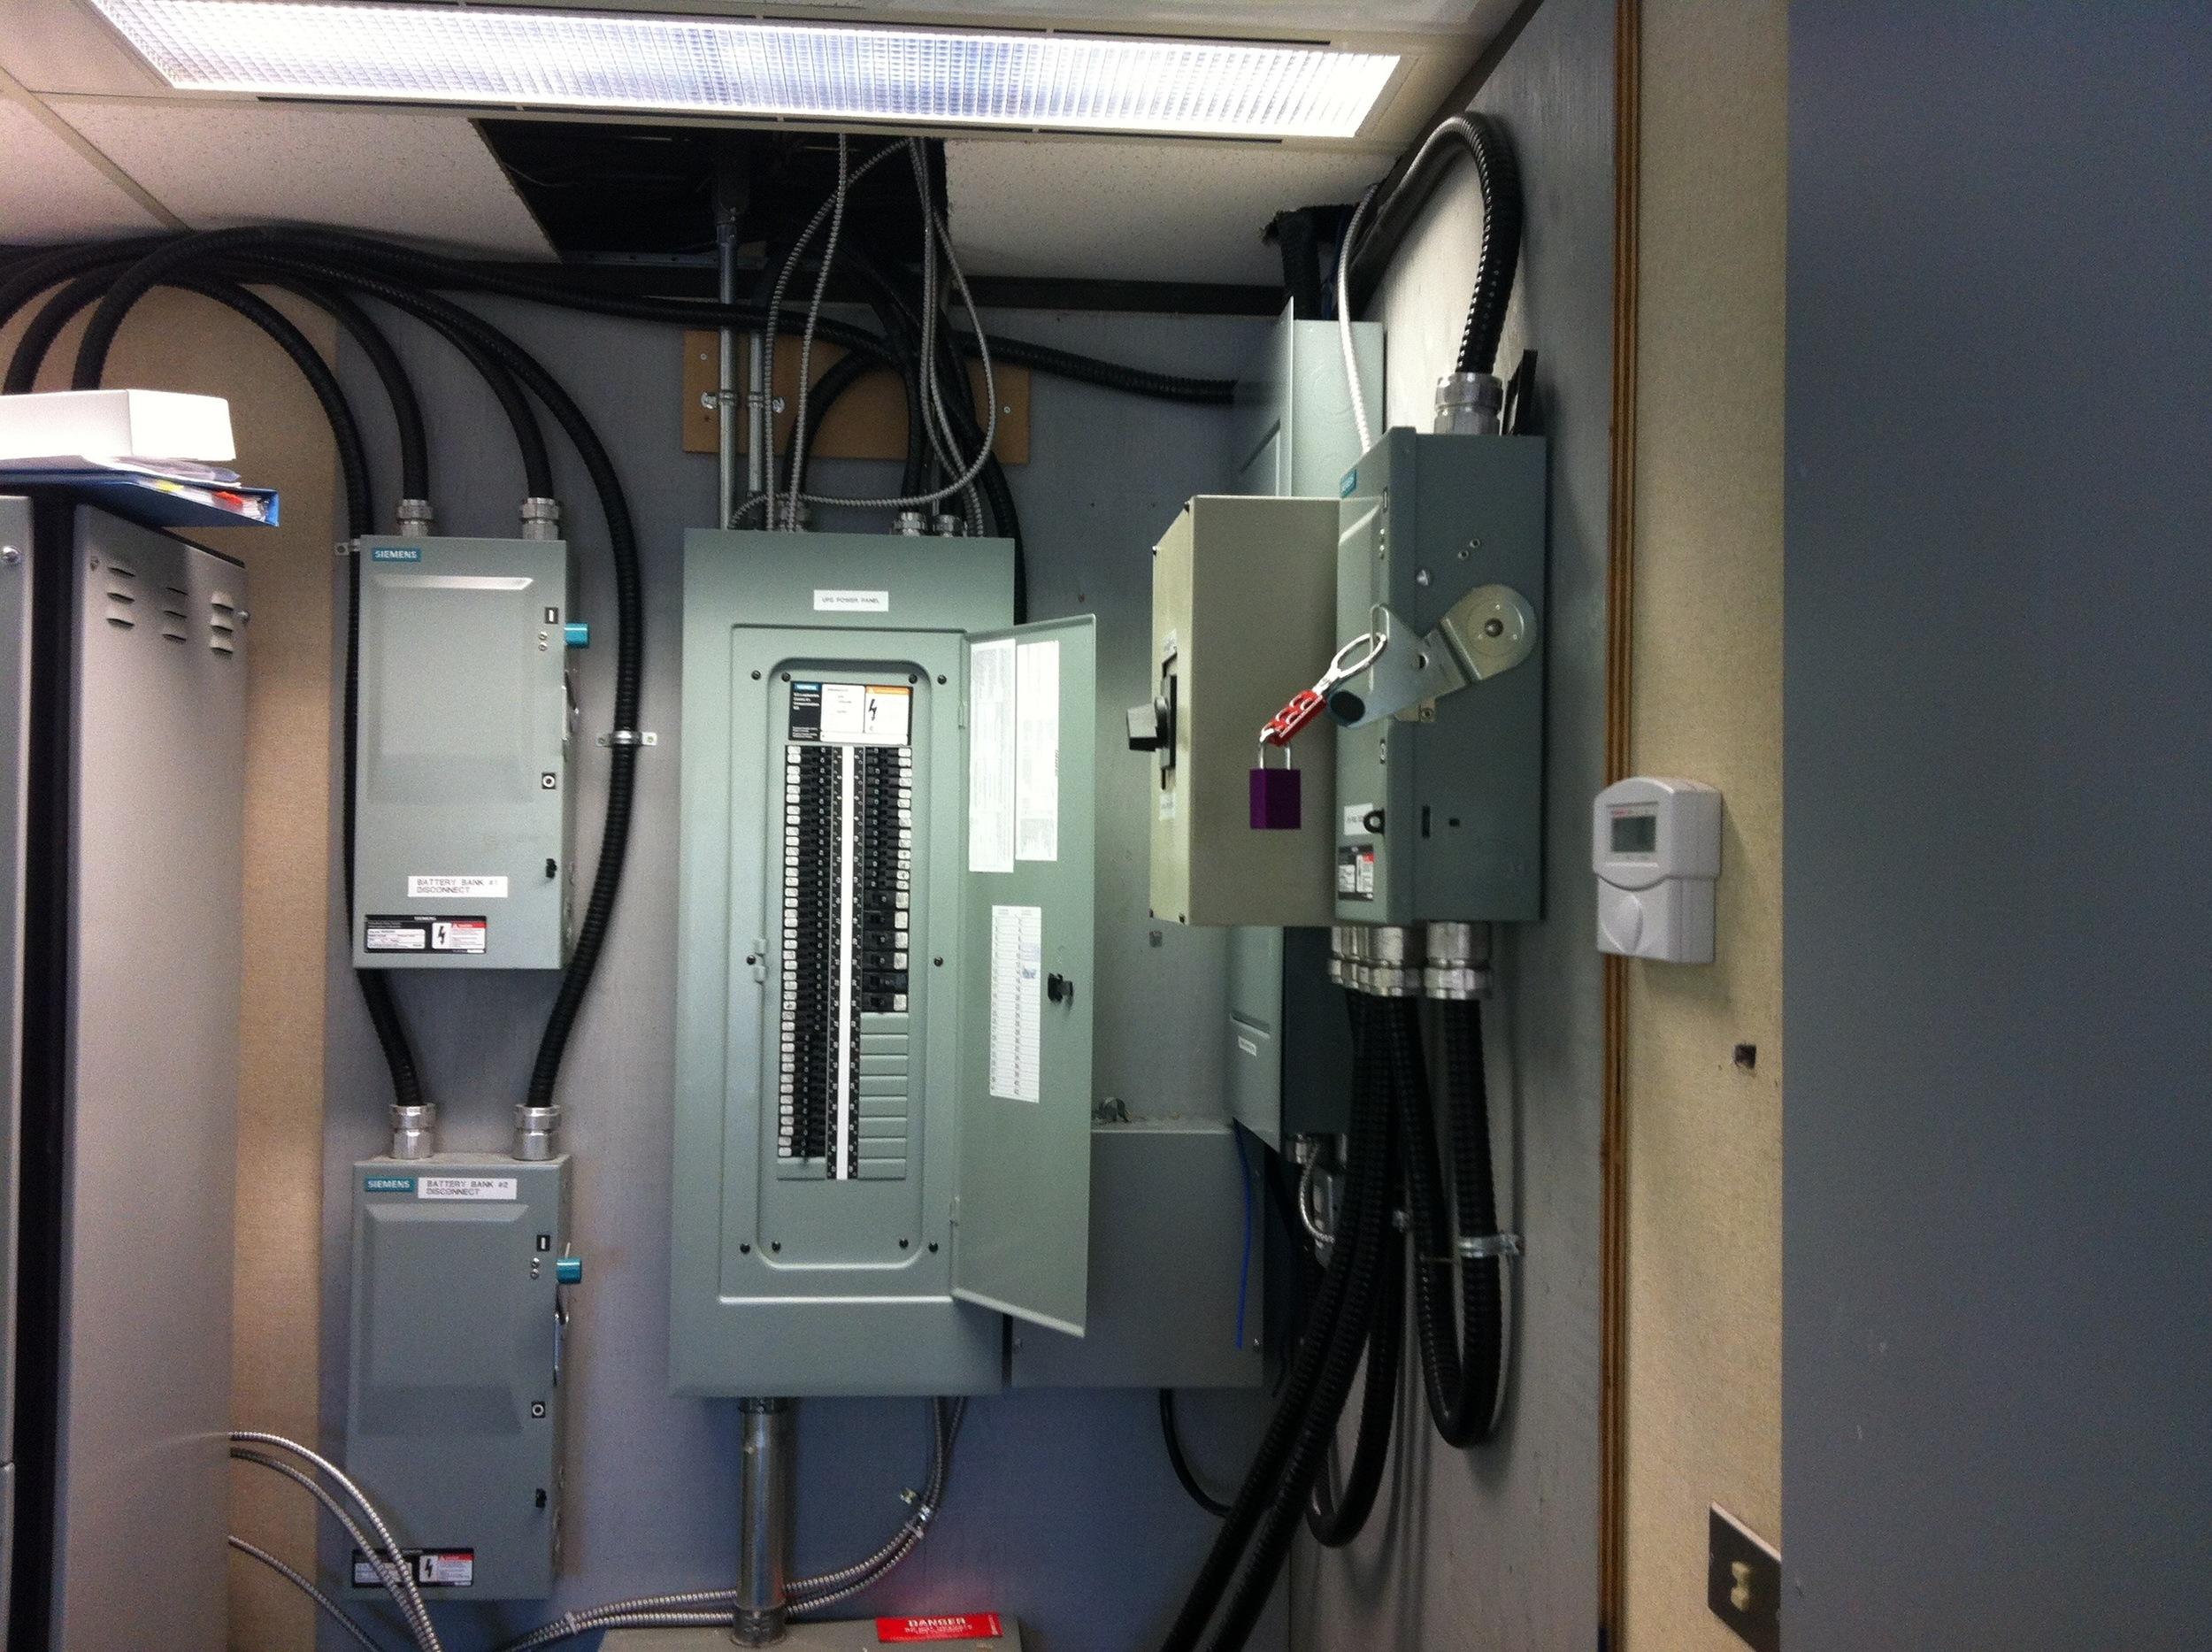 EL01  Electrical - General Contractors Commercial Renovations in Edmonton, Office and Warehouse Project Contractors